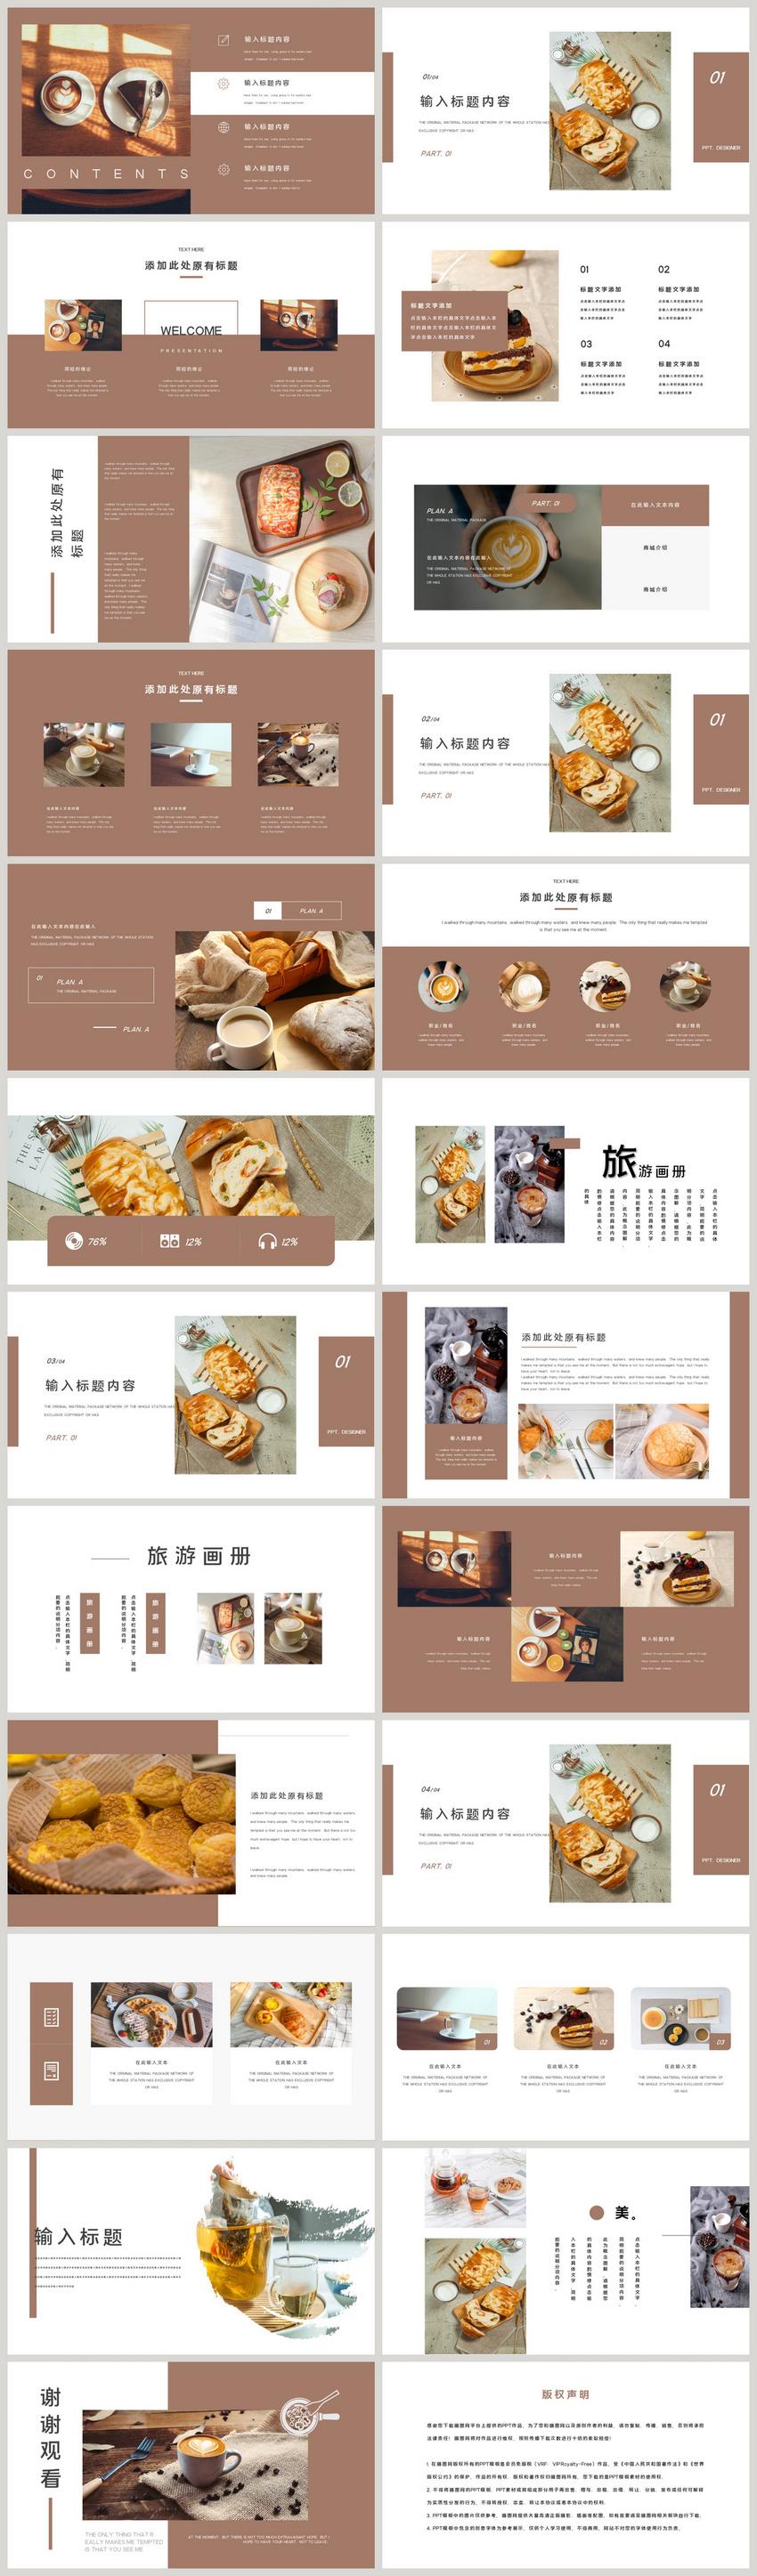 Coffee Dessert Shop Food Album Ppt Template Powerpoint Templete Ppt Free Download 401659334 Lovepik Com